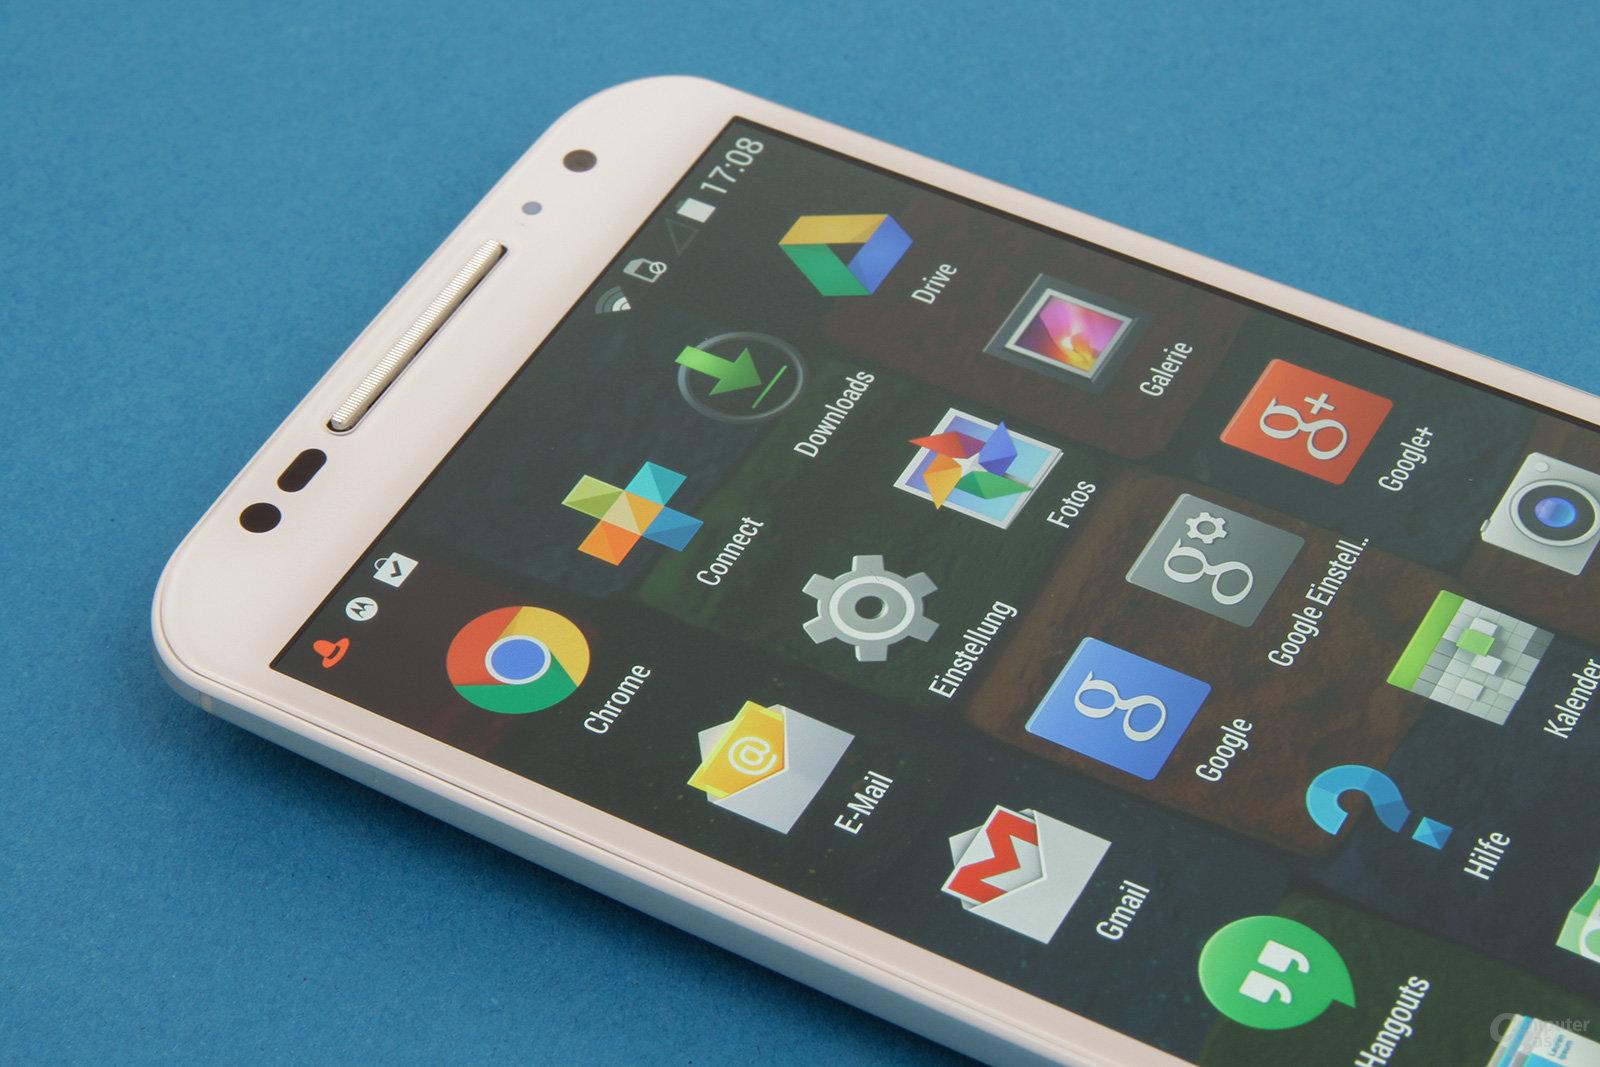 Motorola Moto X 2014 – Nahezu unverändertes Android 4.4.4